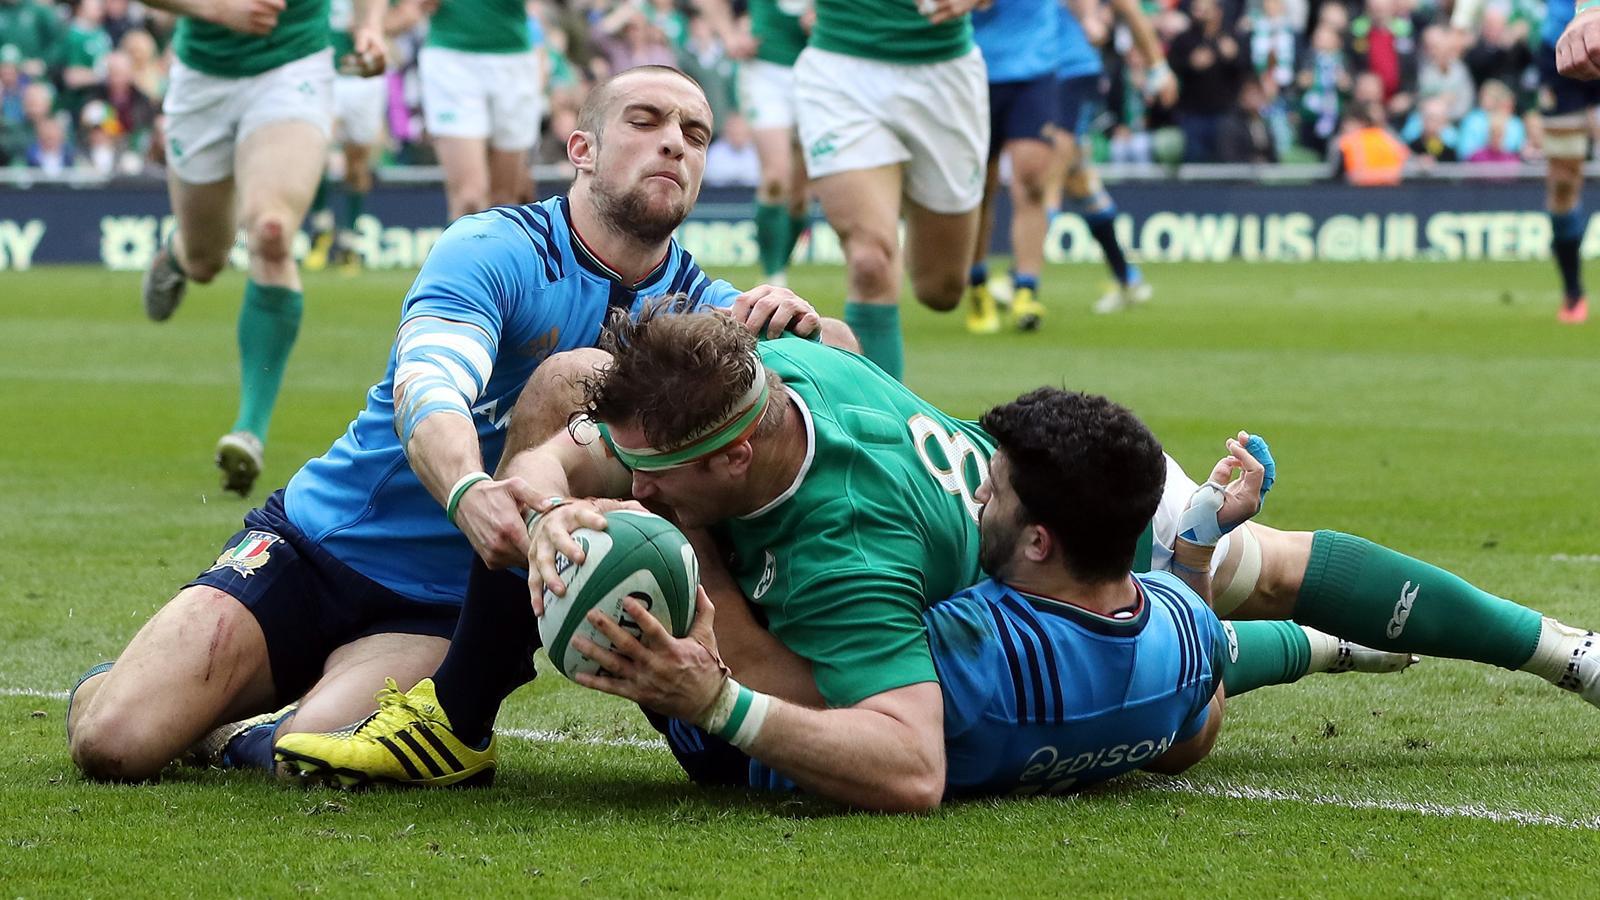 L'essai de Jamie Heaslip (Irlande) face à l'Italie - 12 mars 2016